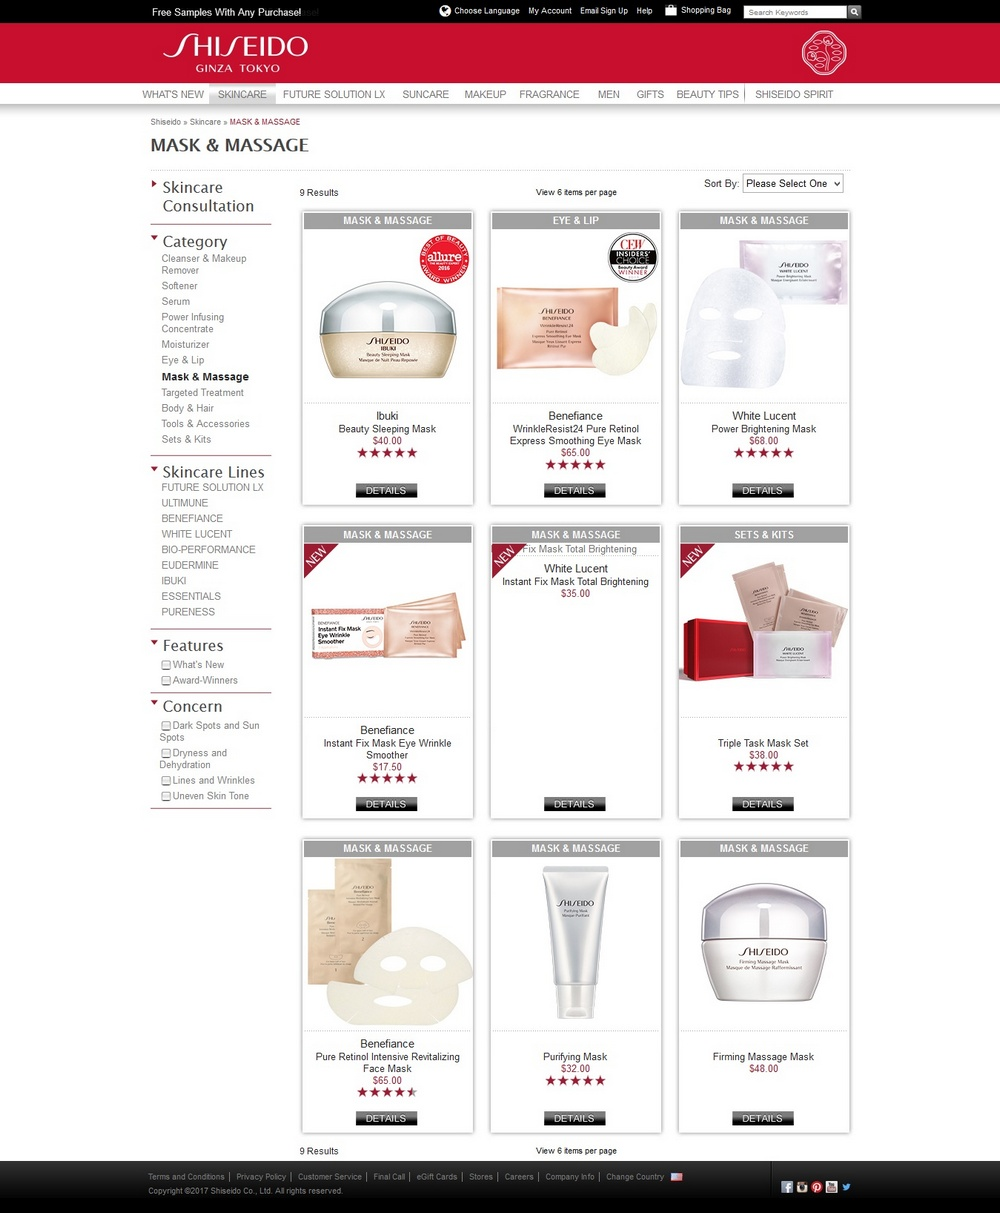 Apakah Sekarang Masih Ada Masker Naturgo Yang Asli Shisedo Maskmasker Lumpur Halaman Resmi Produk Shiseido